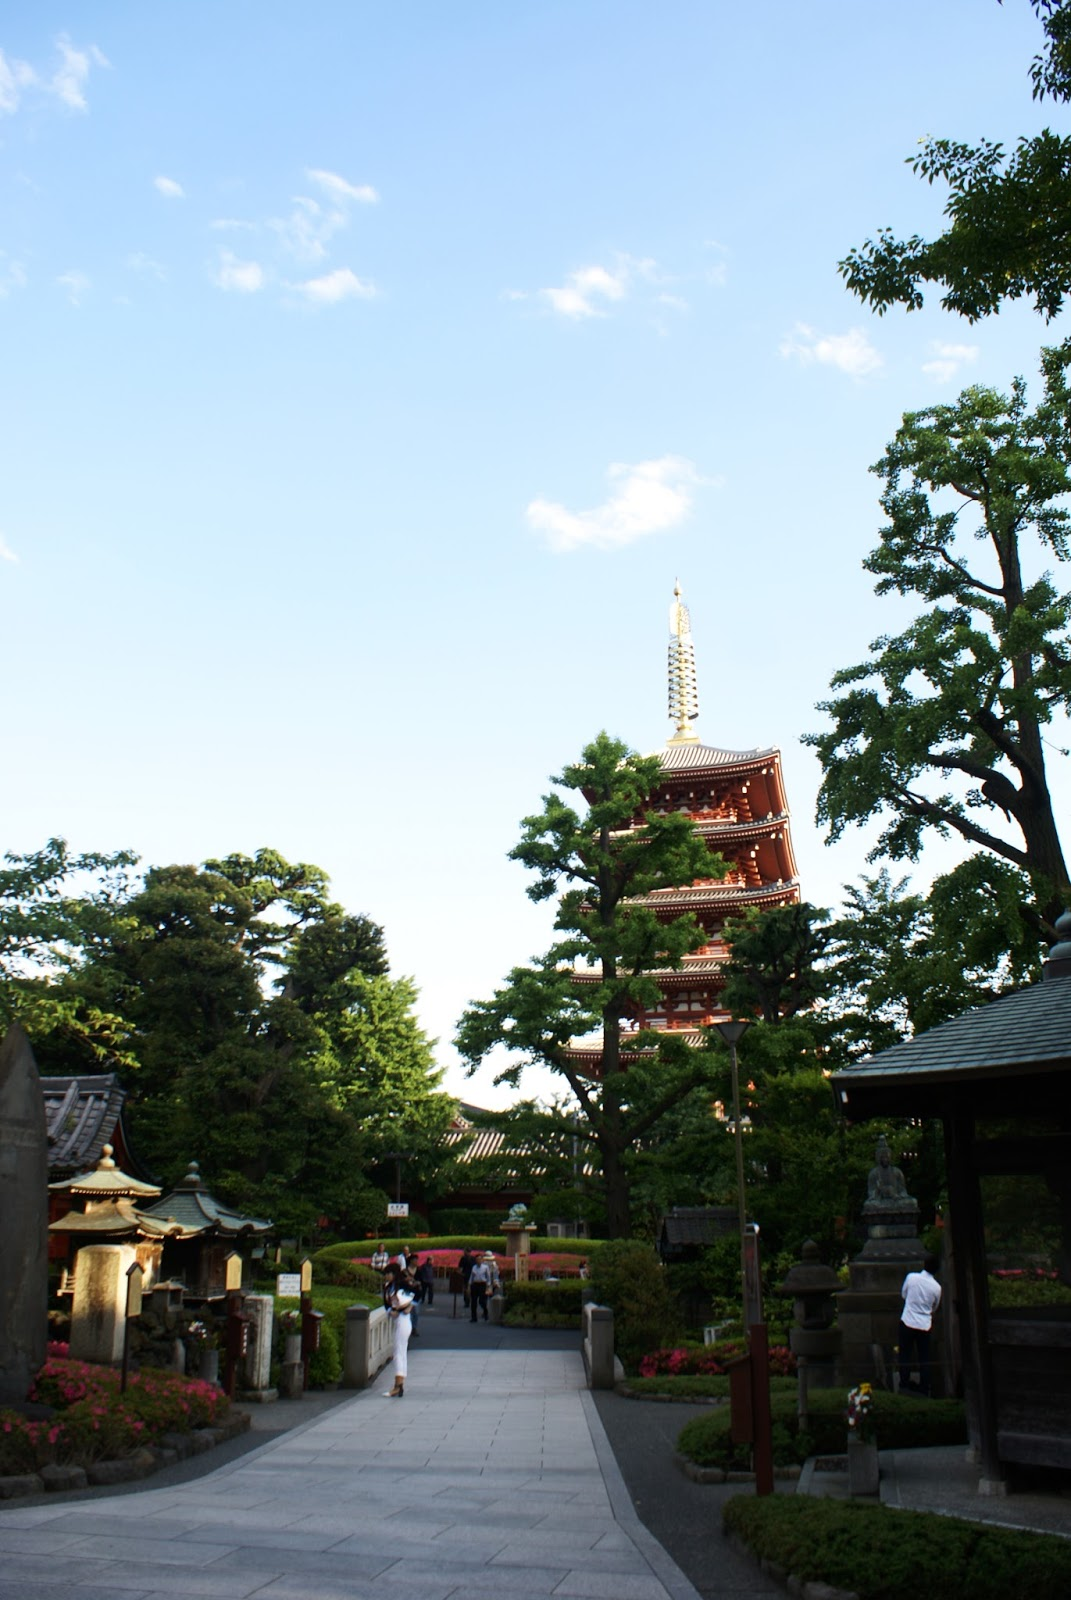 pagoda asakusa senso-ji tokyo japan